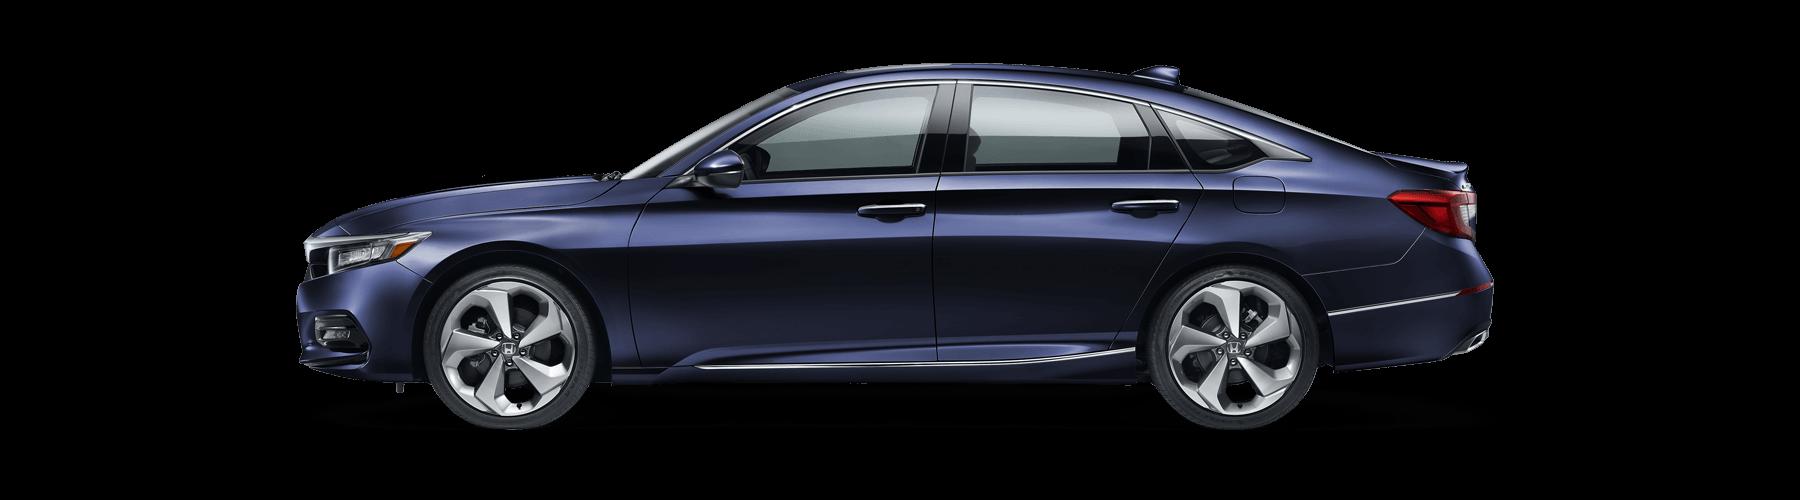 2018 Honda Accord Sedan Side Profile